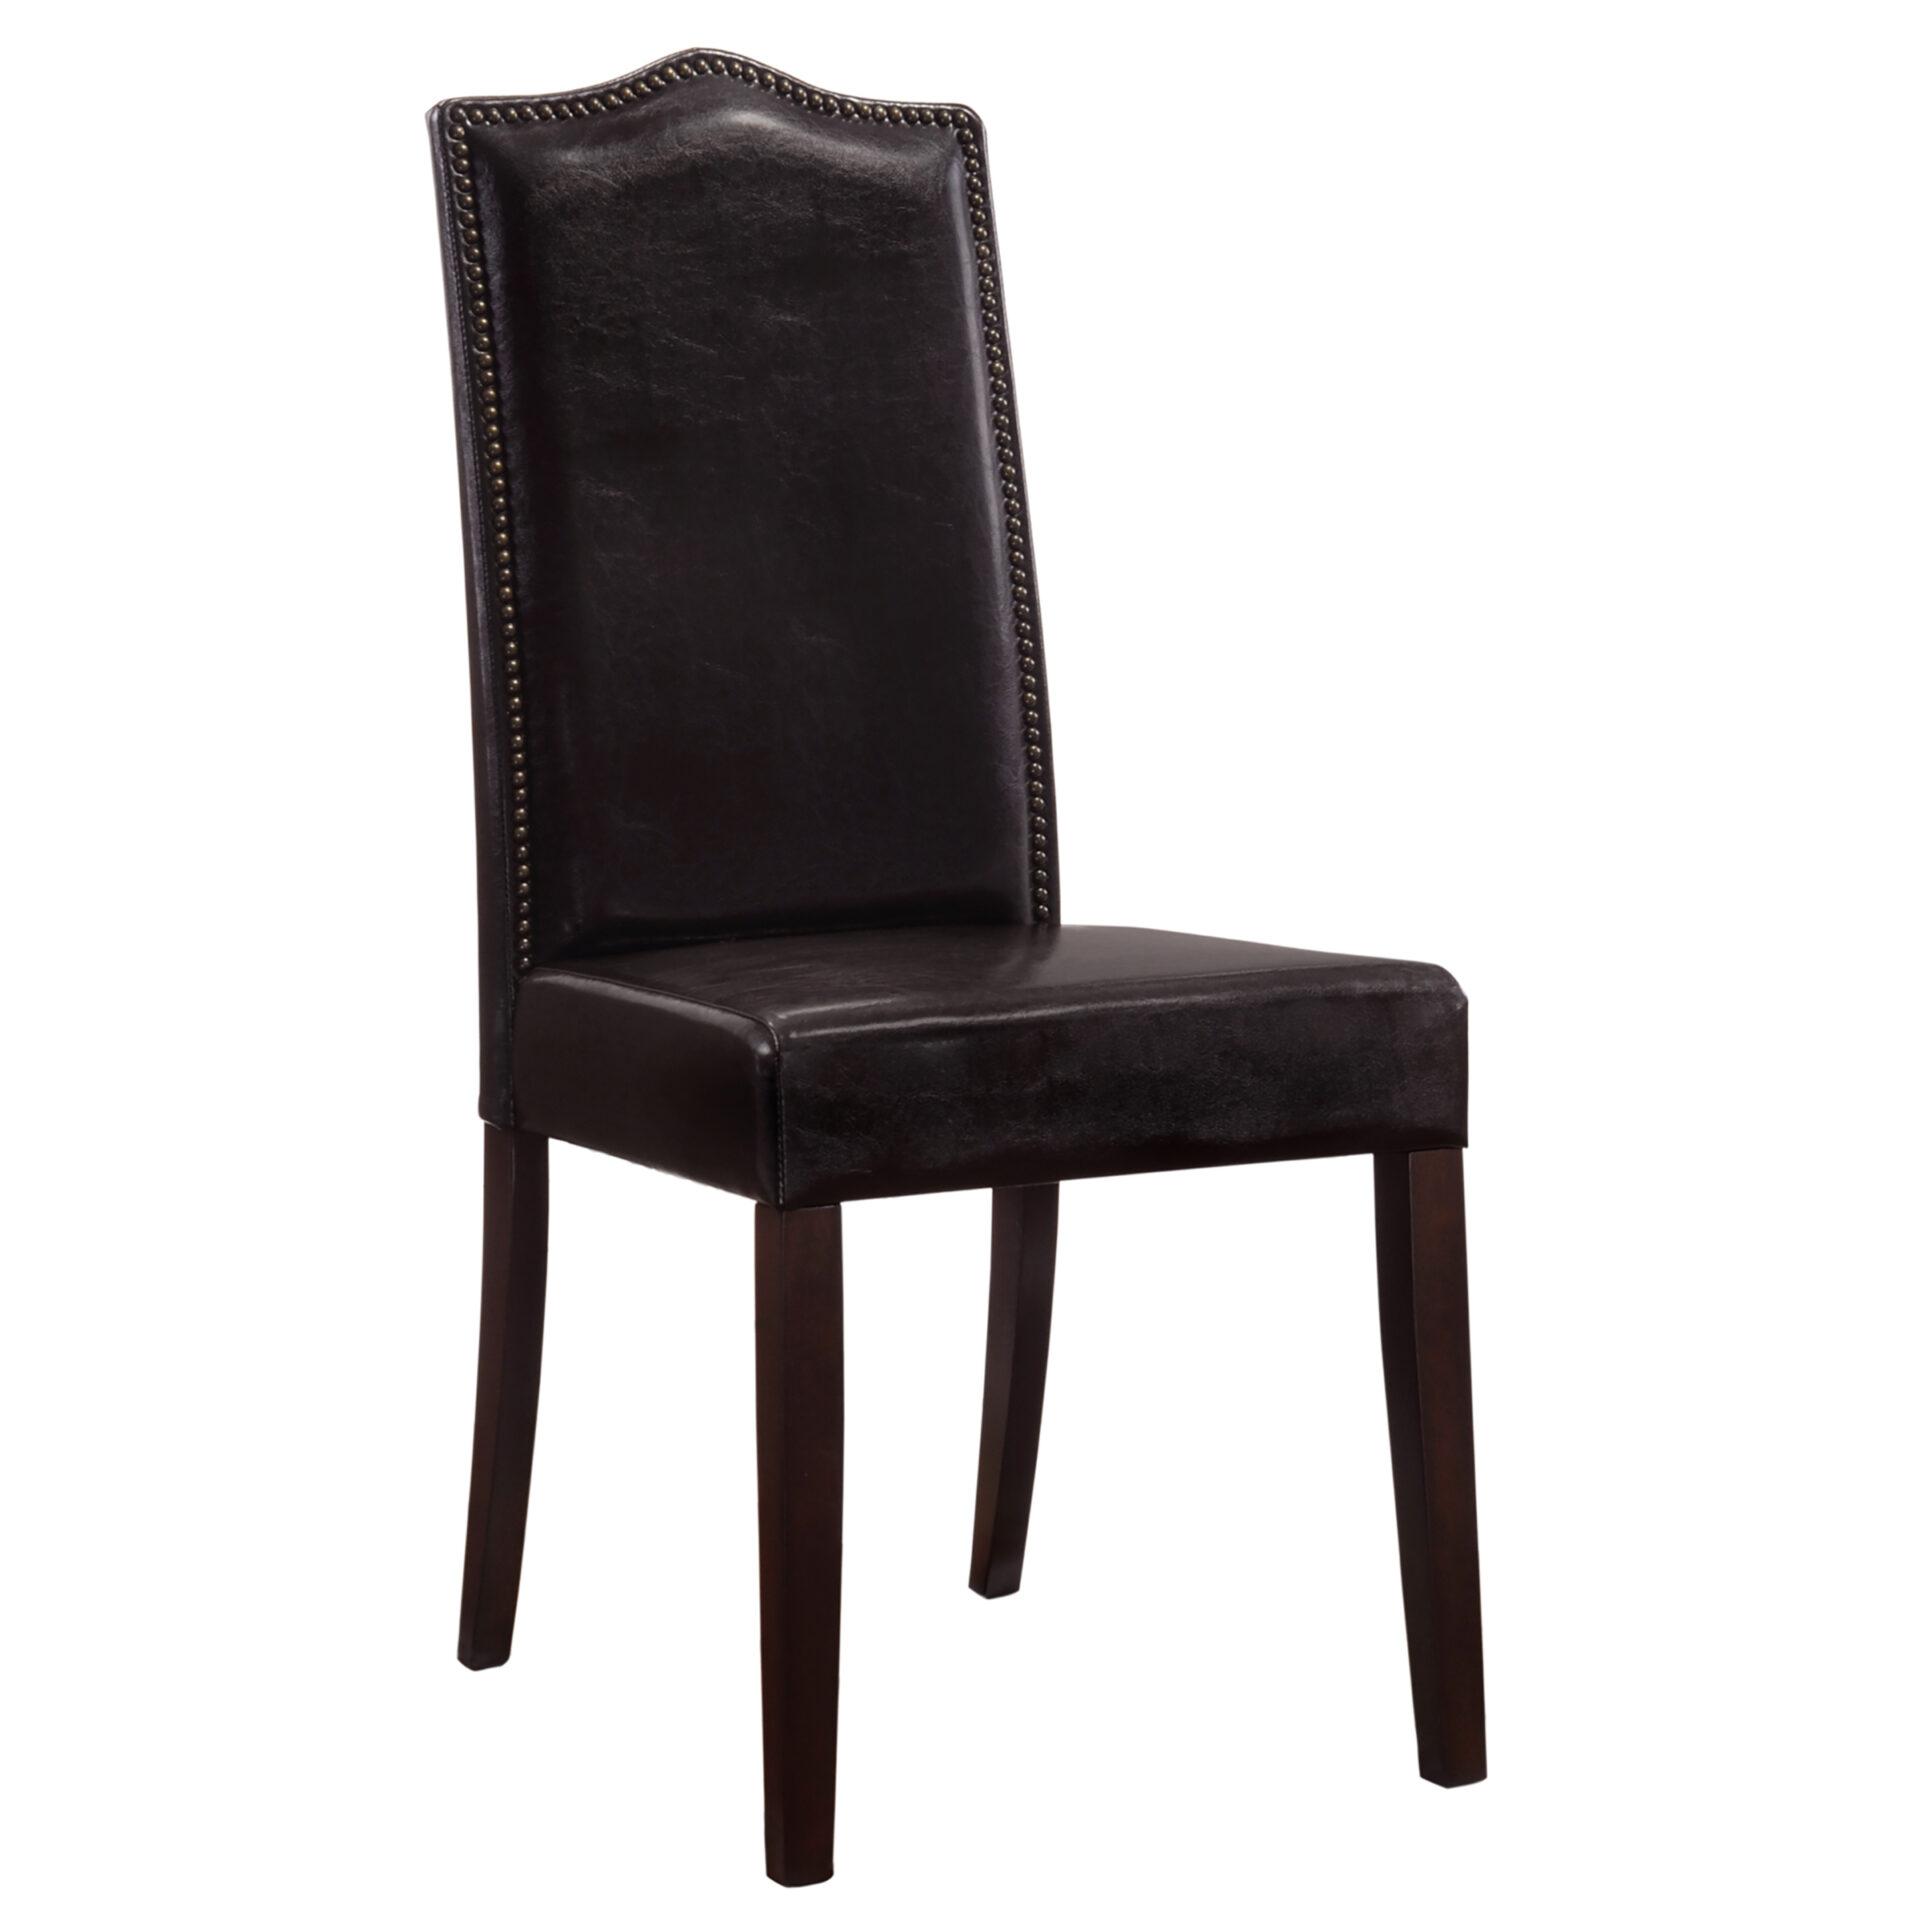 Hudson Nail Head Parson Chair, Espresso w/ Espresso